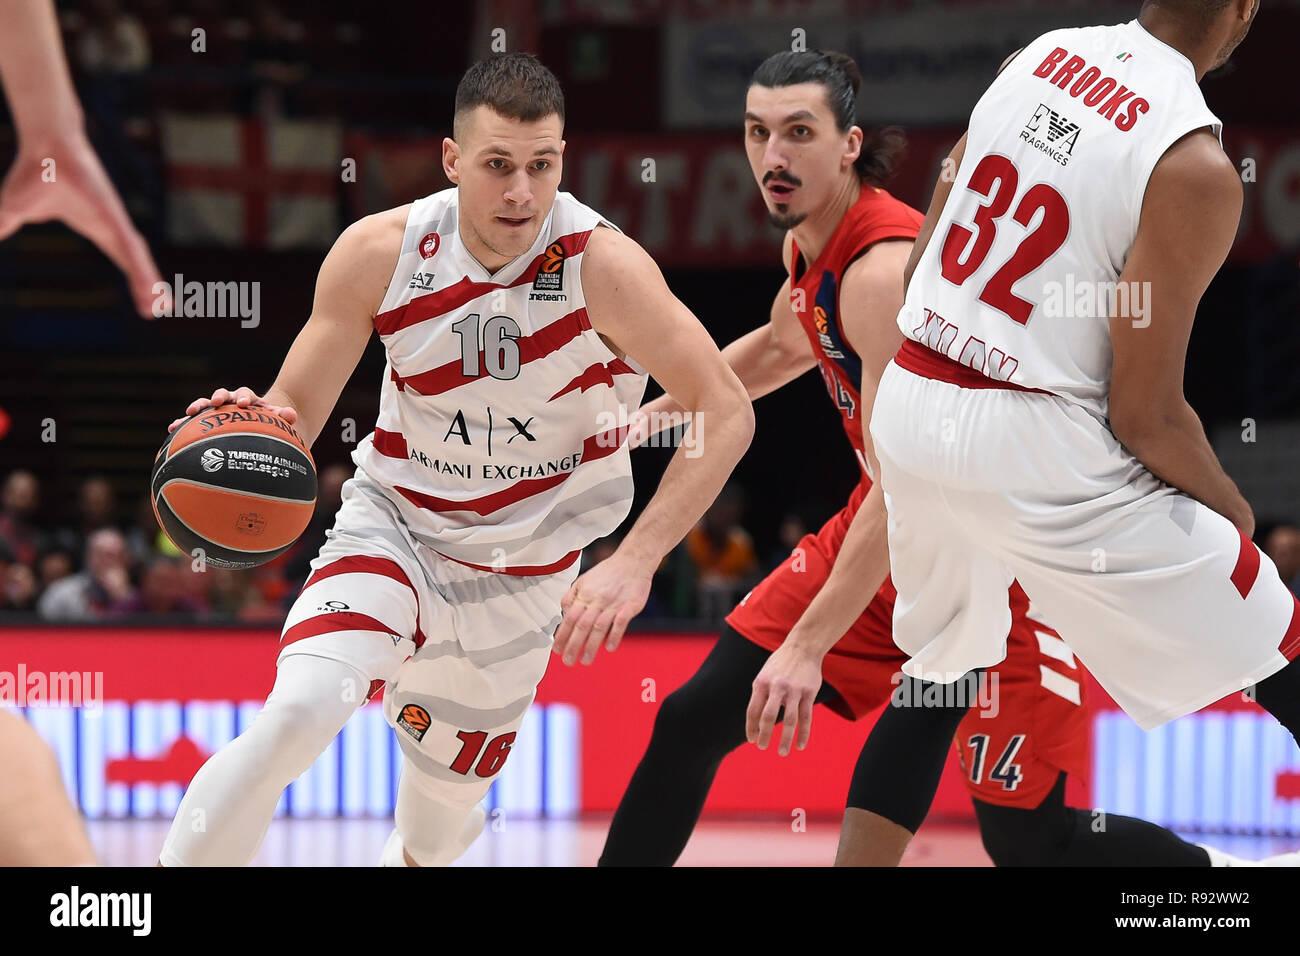 d692892bc40 Foto Claudio Grassi/LaPresse 19 dicembre 2018 Assago (MI) Italia sport  basket AX